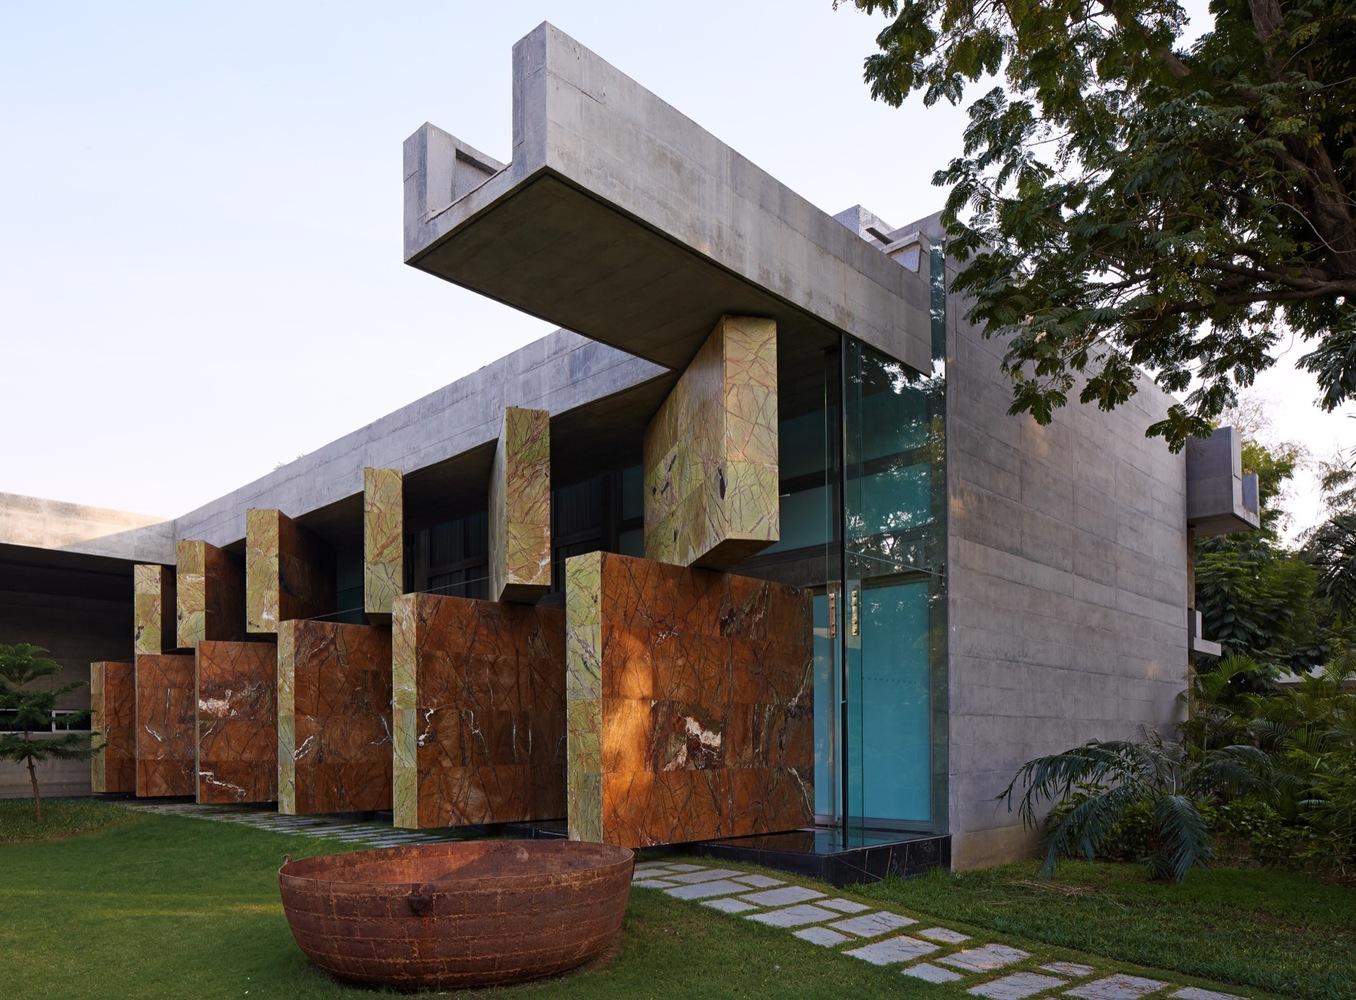 Projeto moderno de casa bonita